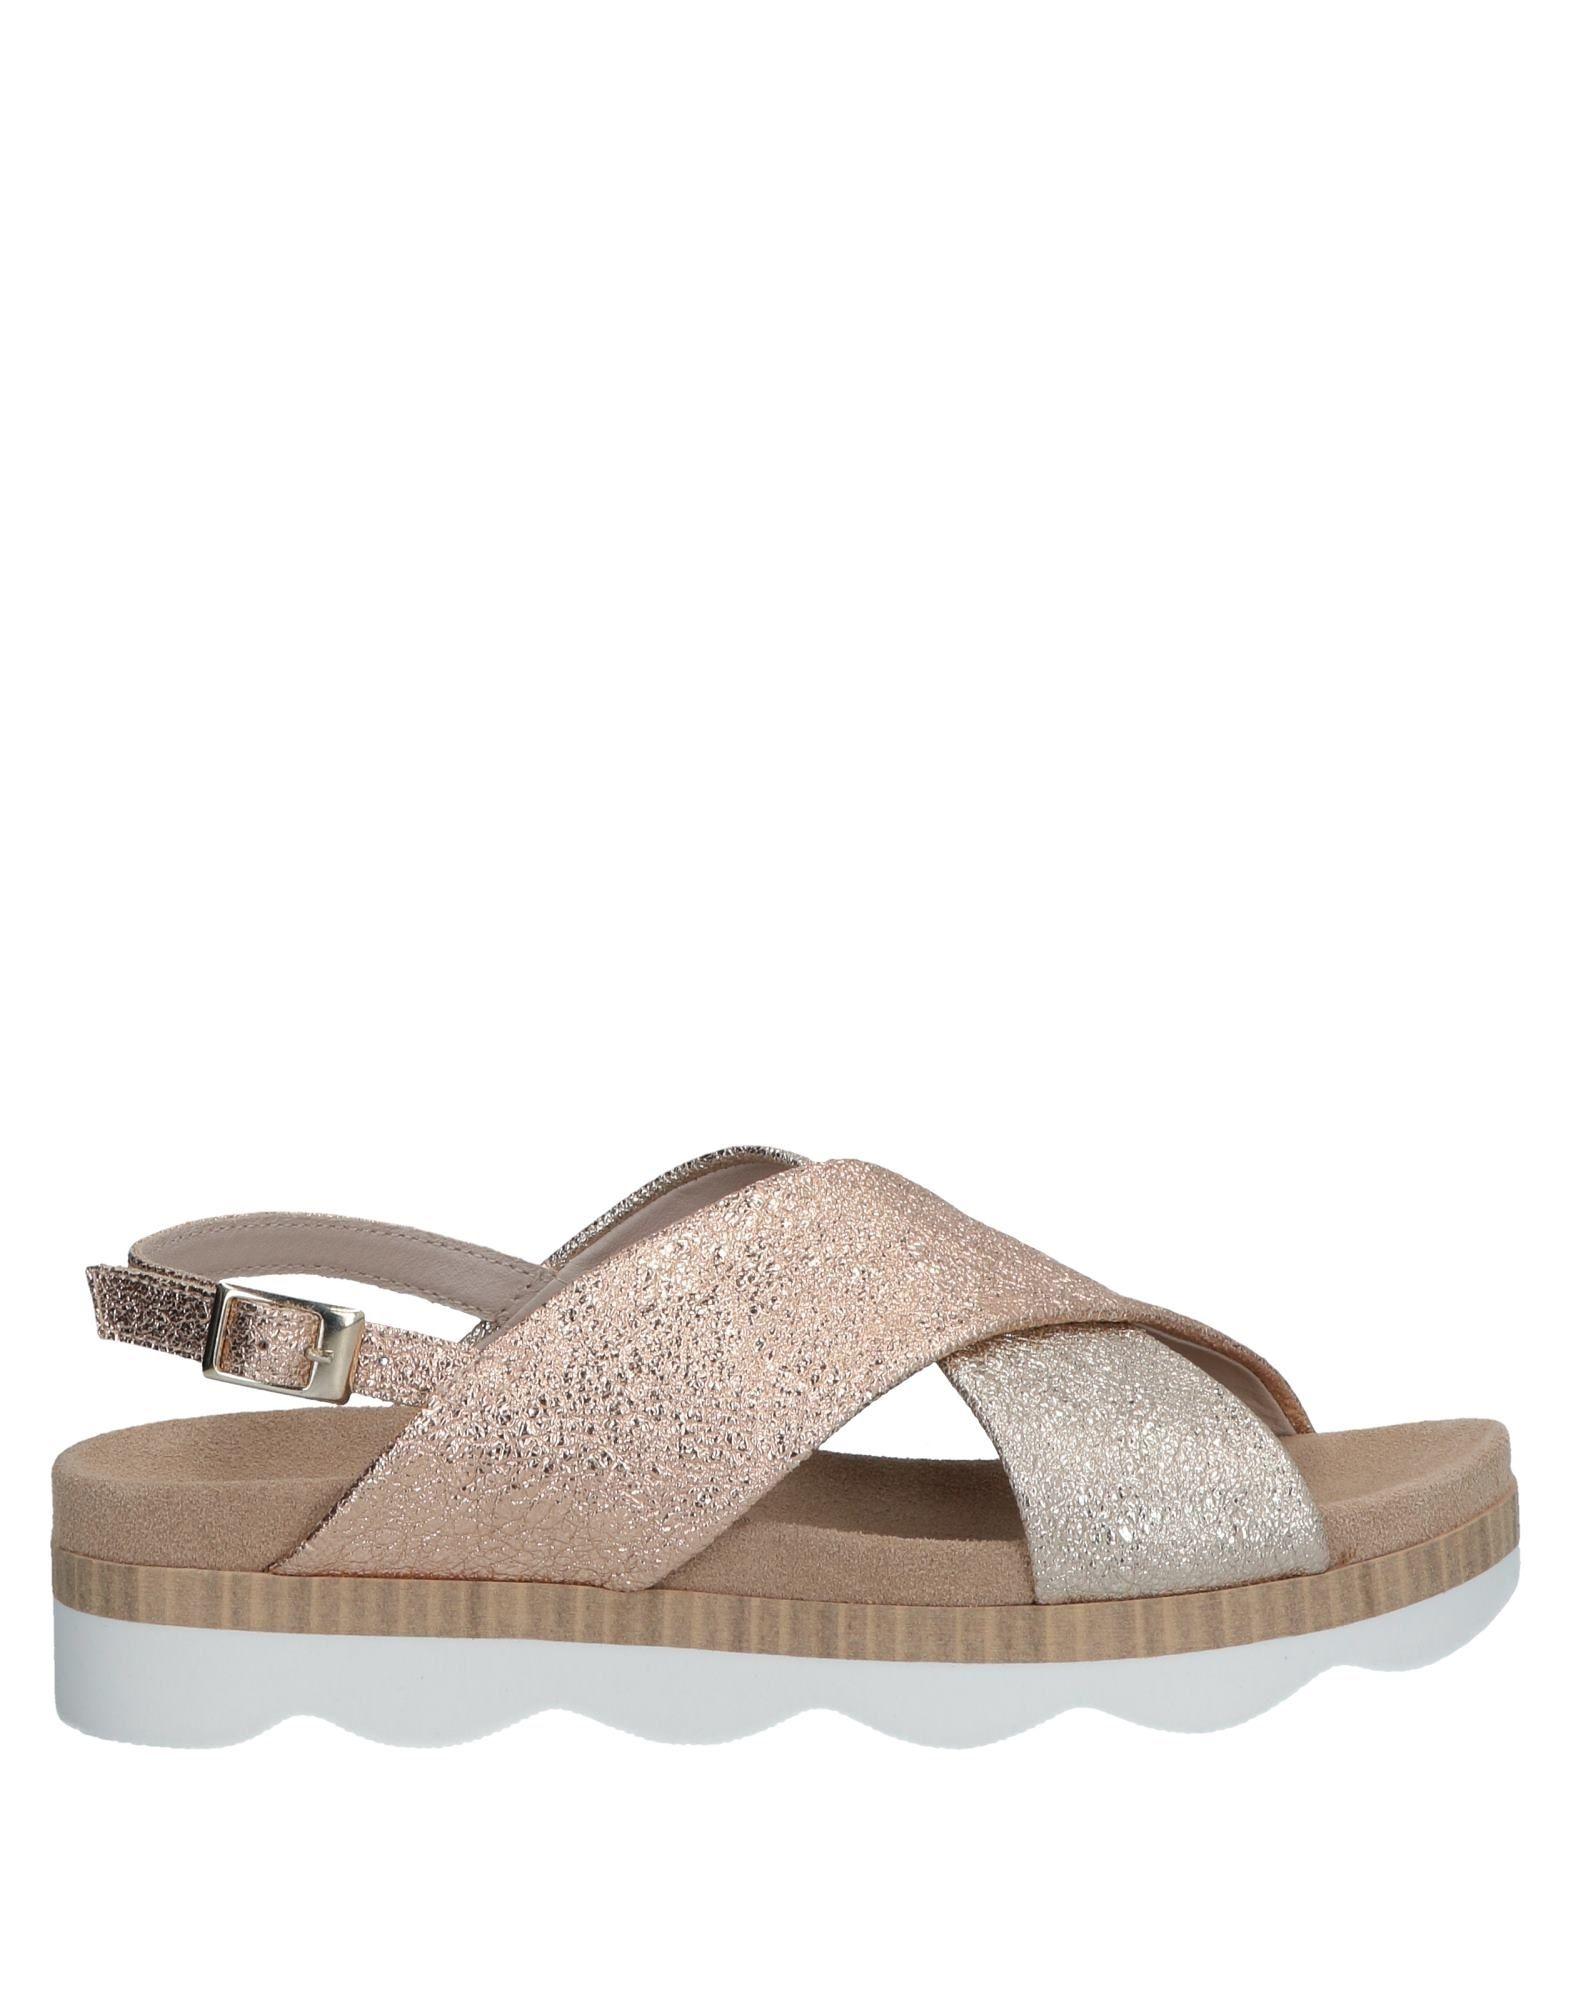 Sandales Tosca bleu chaussures Femme - Sandales Tosca bleu chaussures   - 11571659FJ